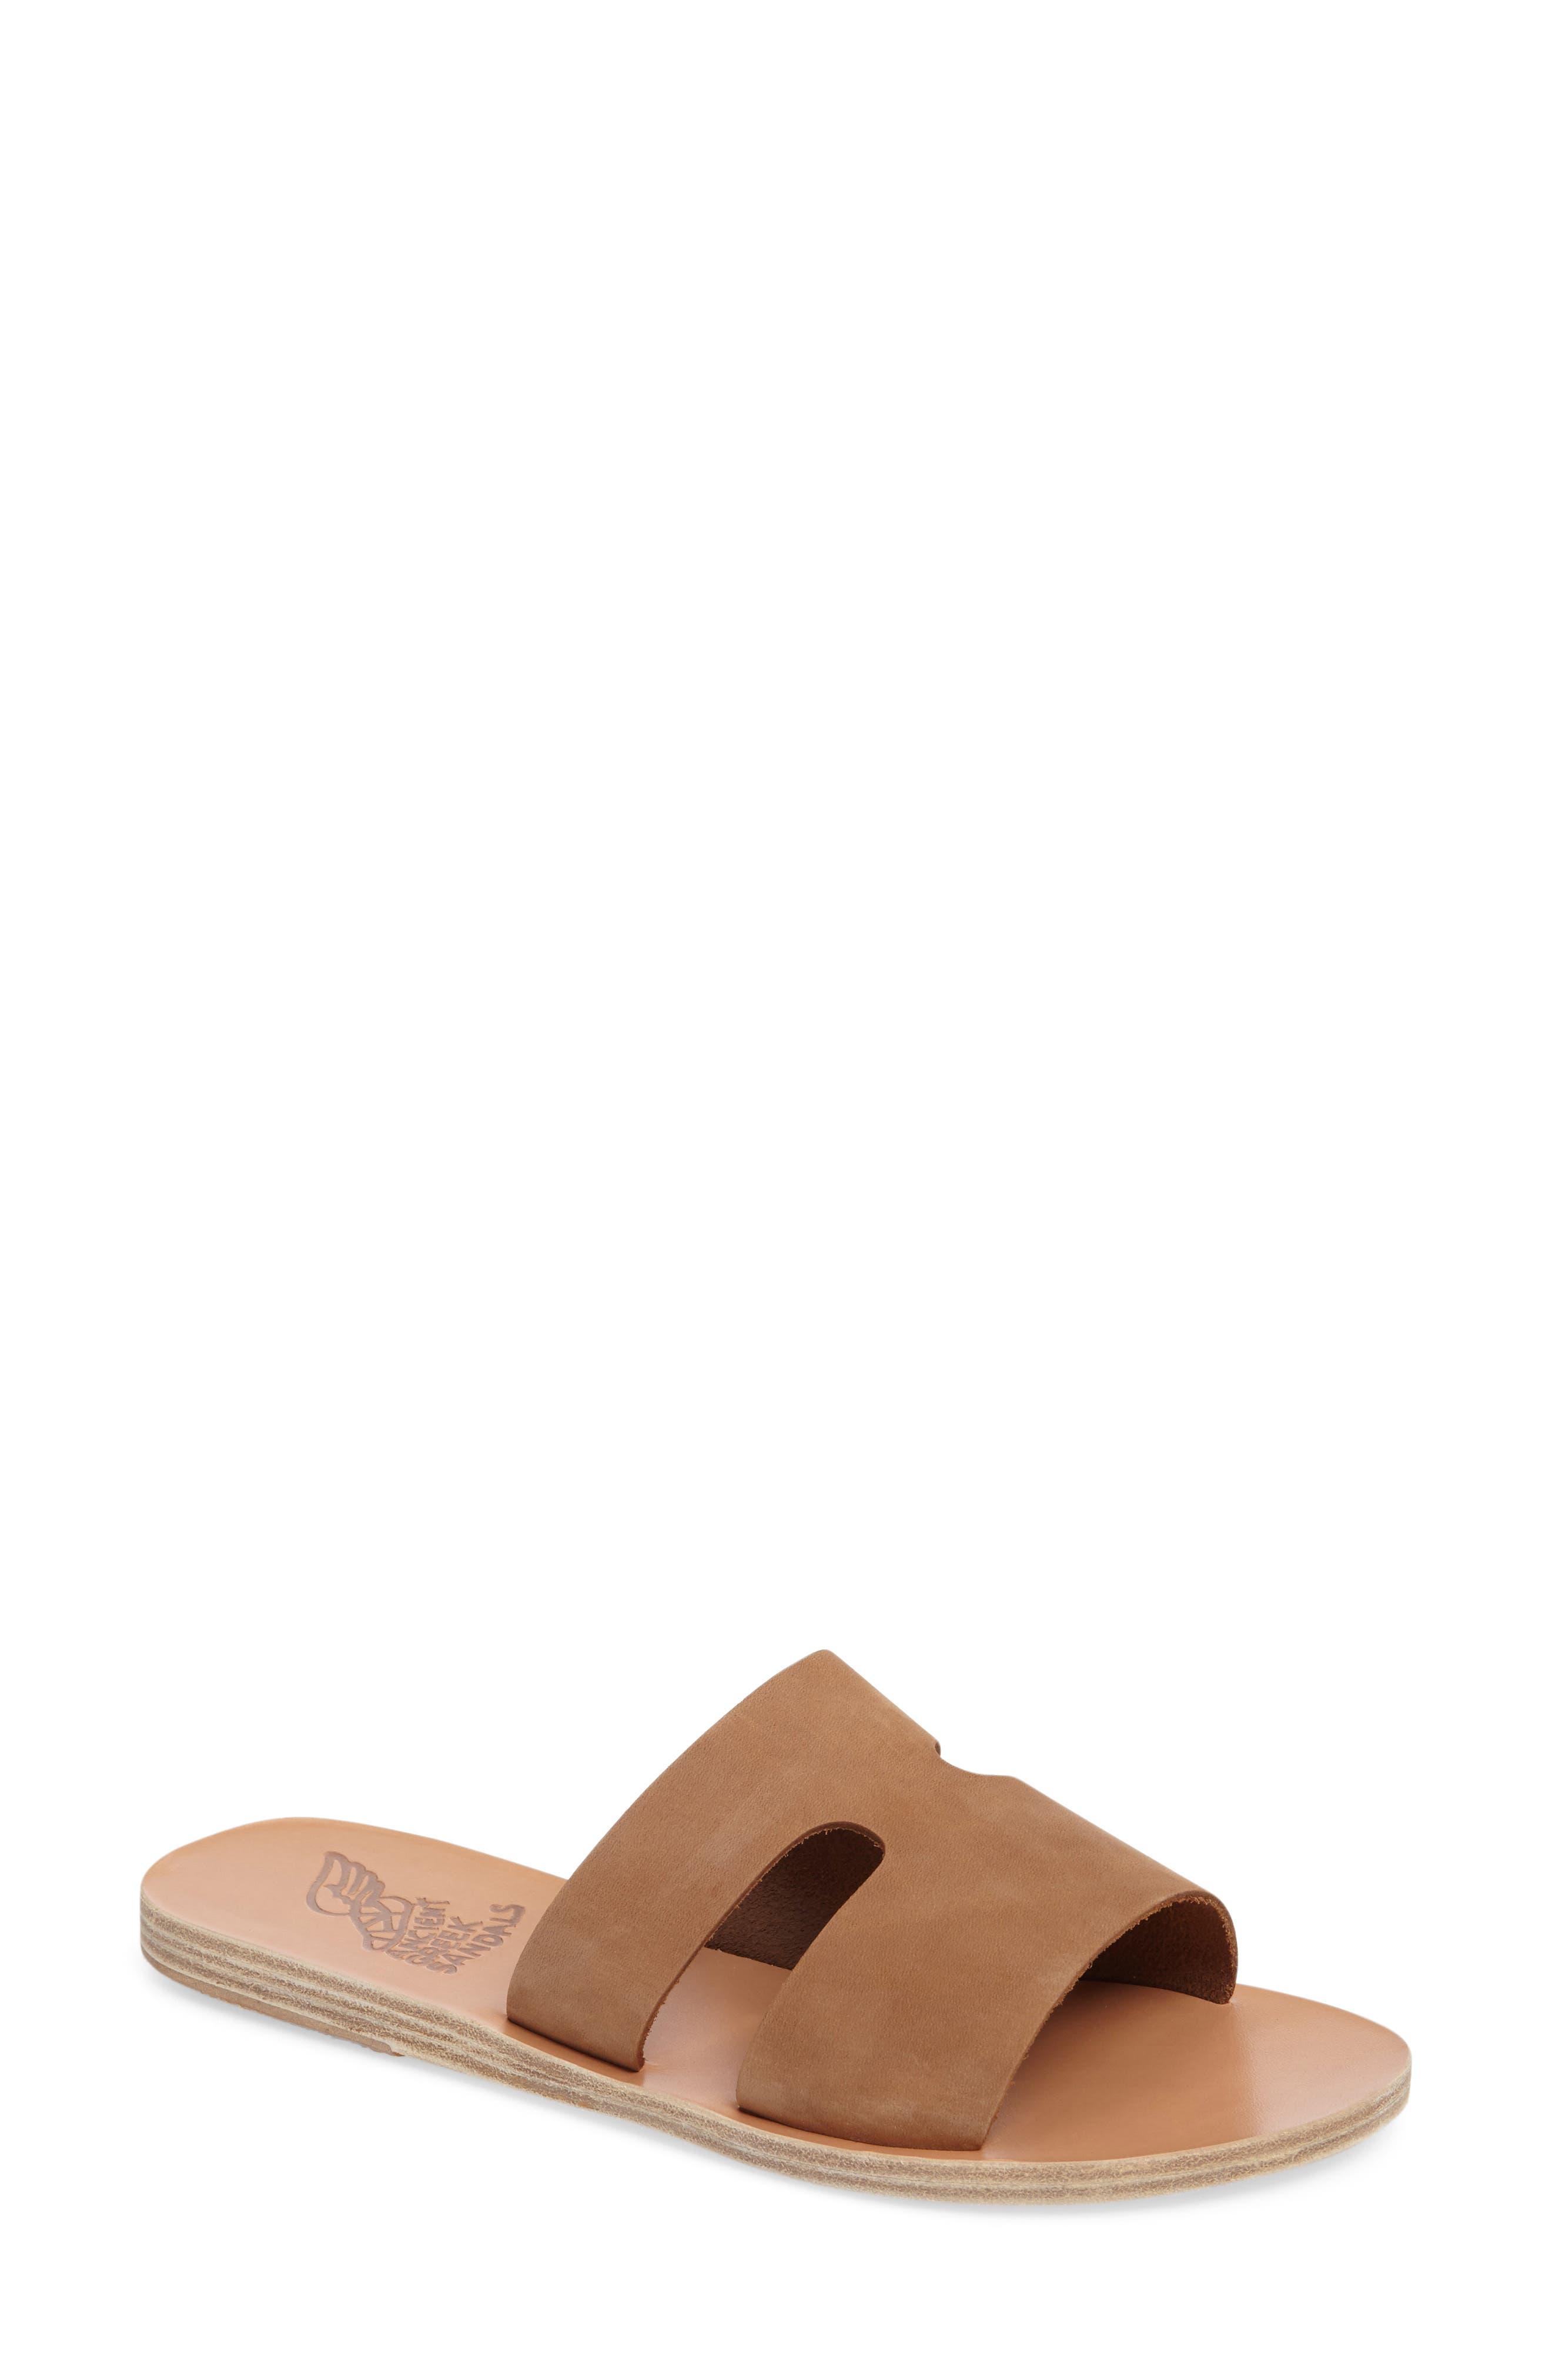 Main Image - Ancient Greek Sandals Apteros Slide Sandal (Women)